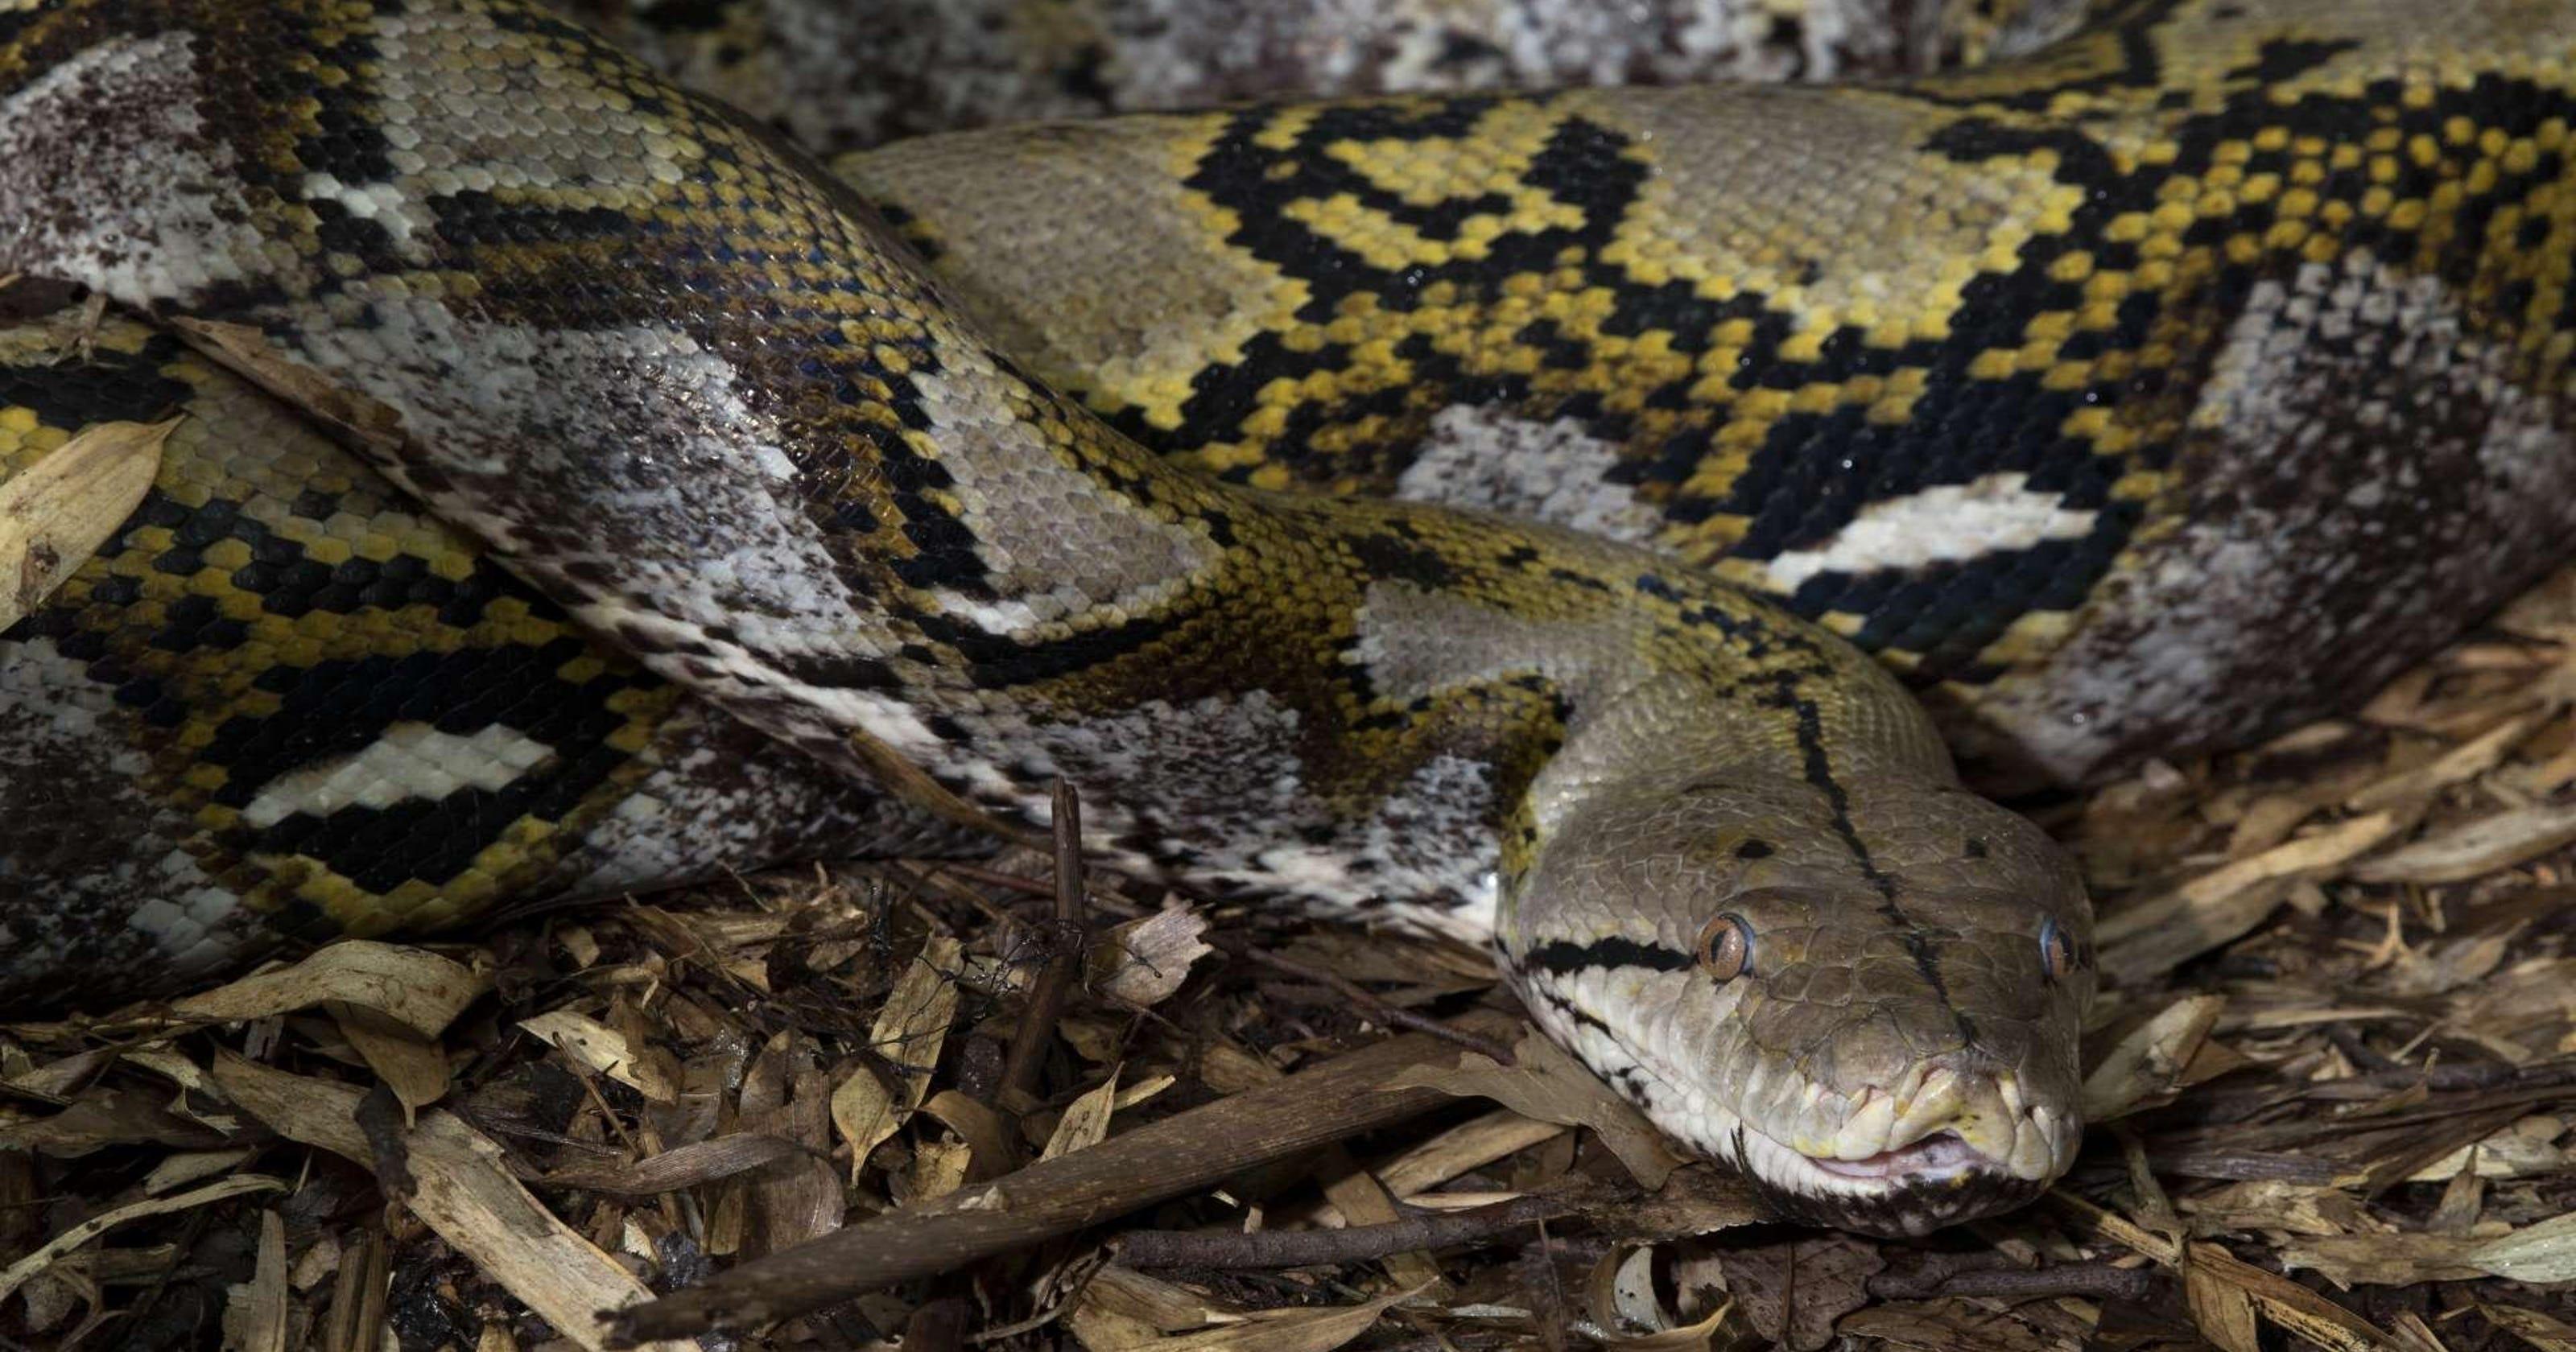 23-foot-long python swallows Indonesian woman